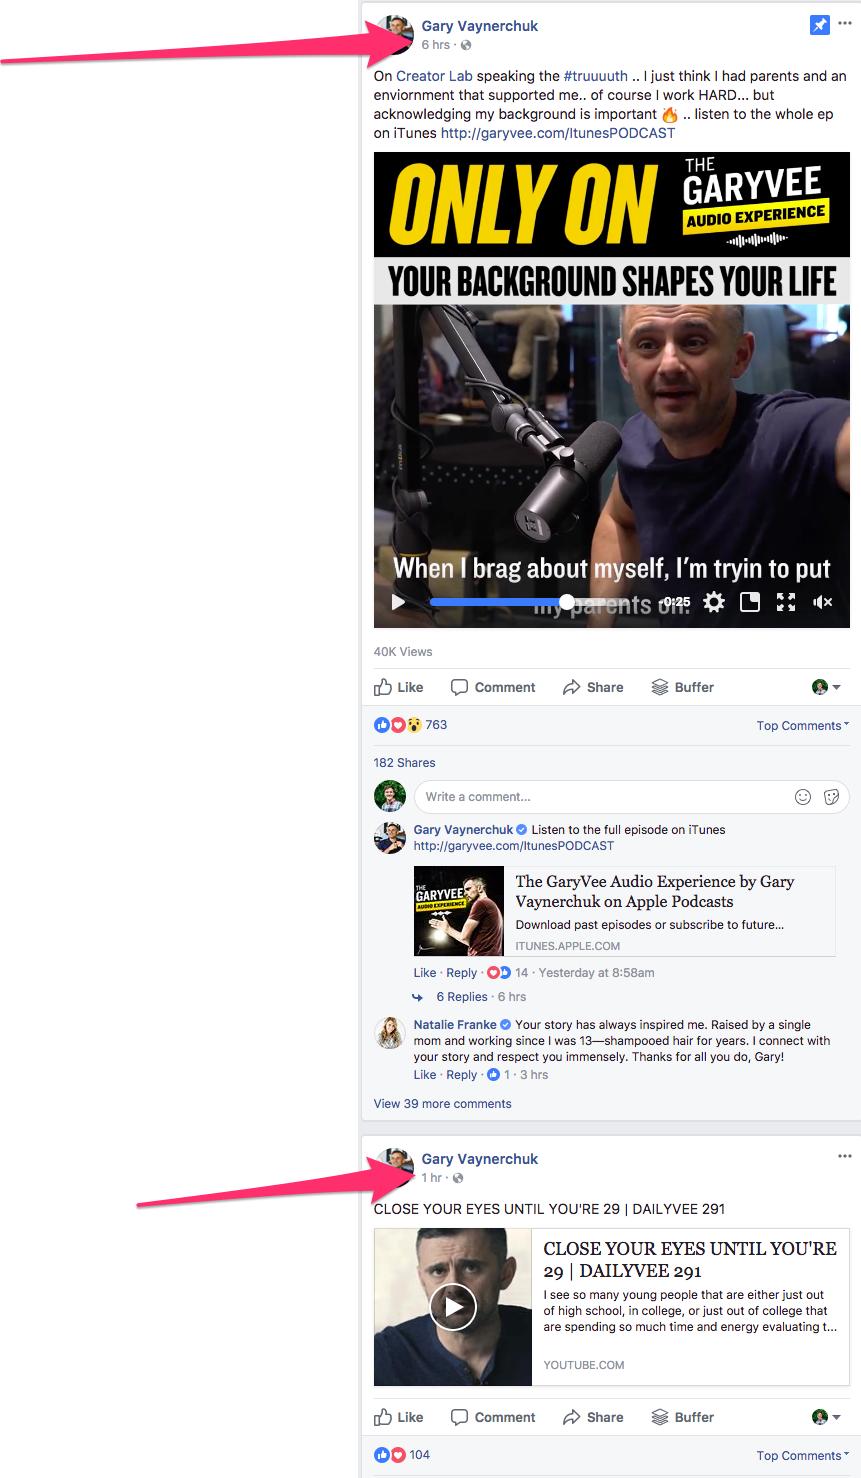 1 Gary Vaynerchuk Posts